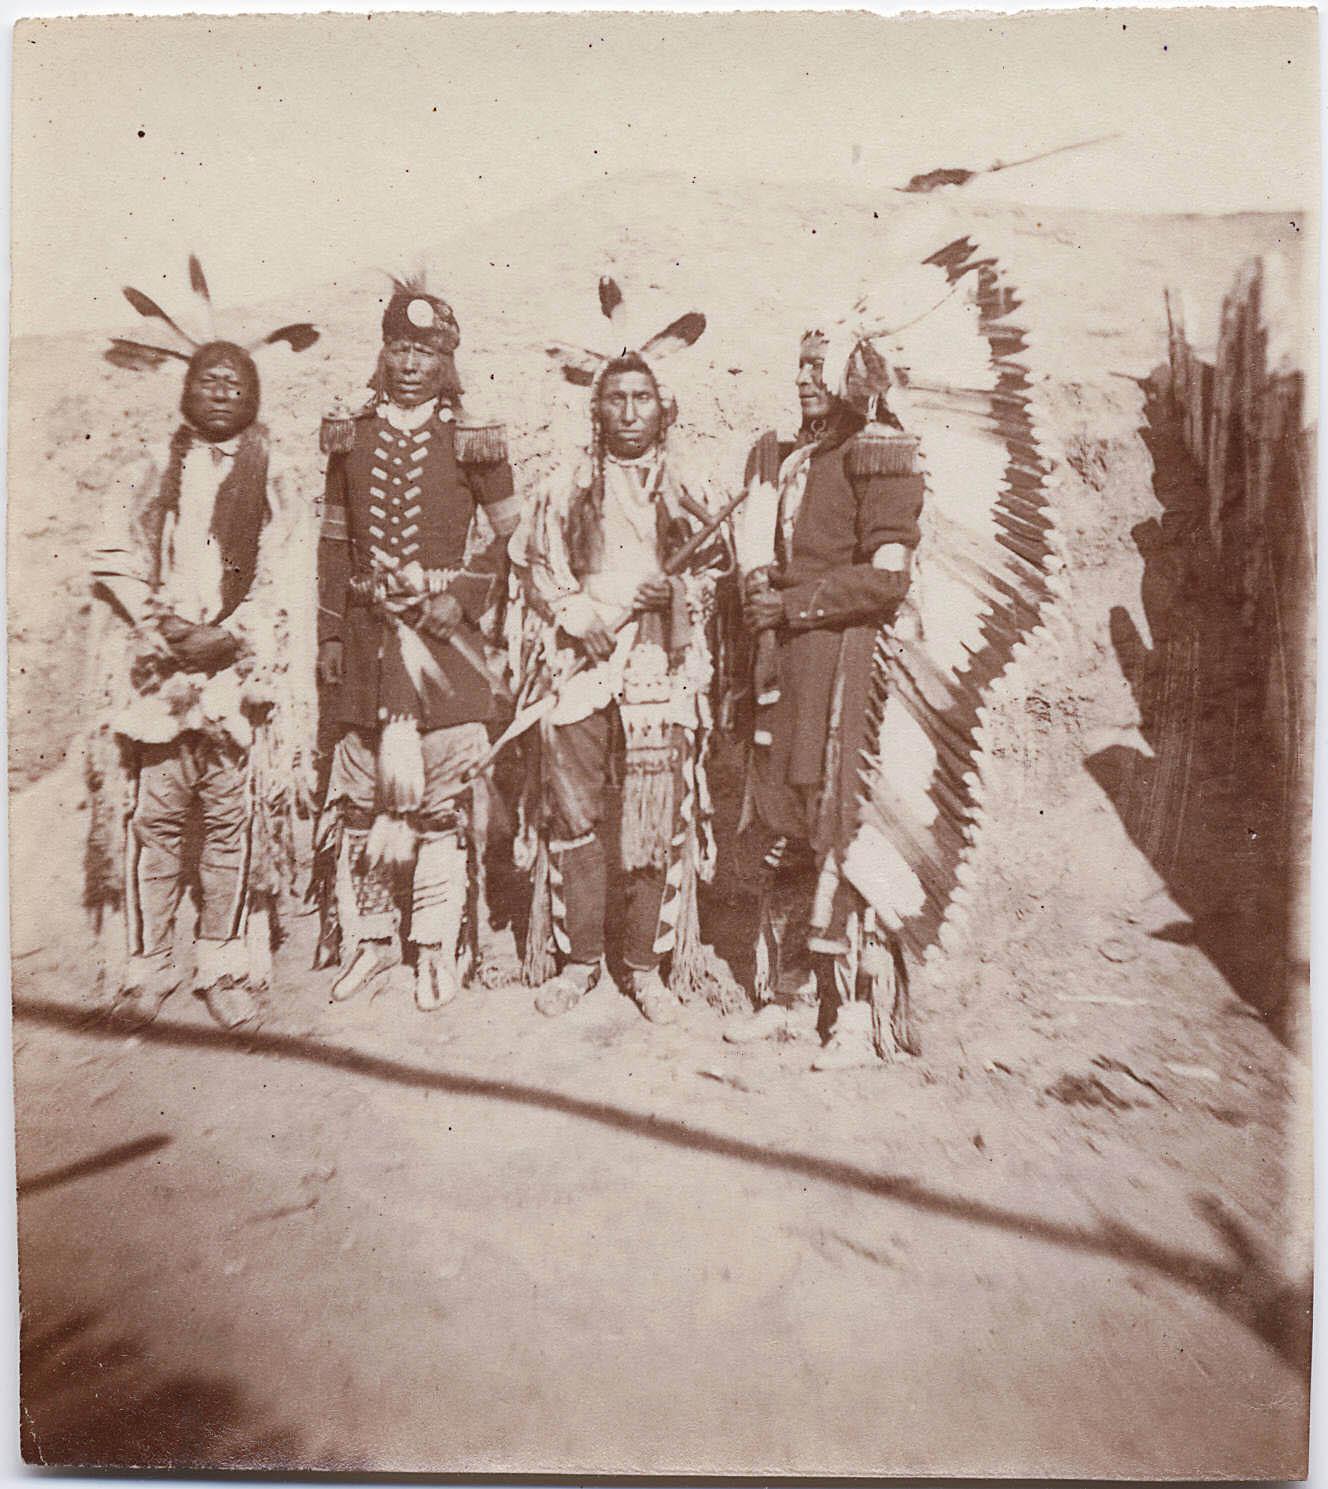 http://www.american-tribes.com/messageboards/dietmar/Morrow5.jpg